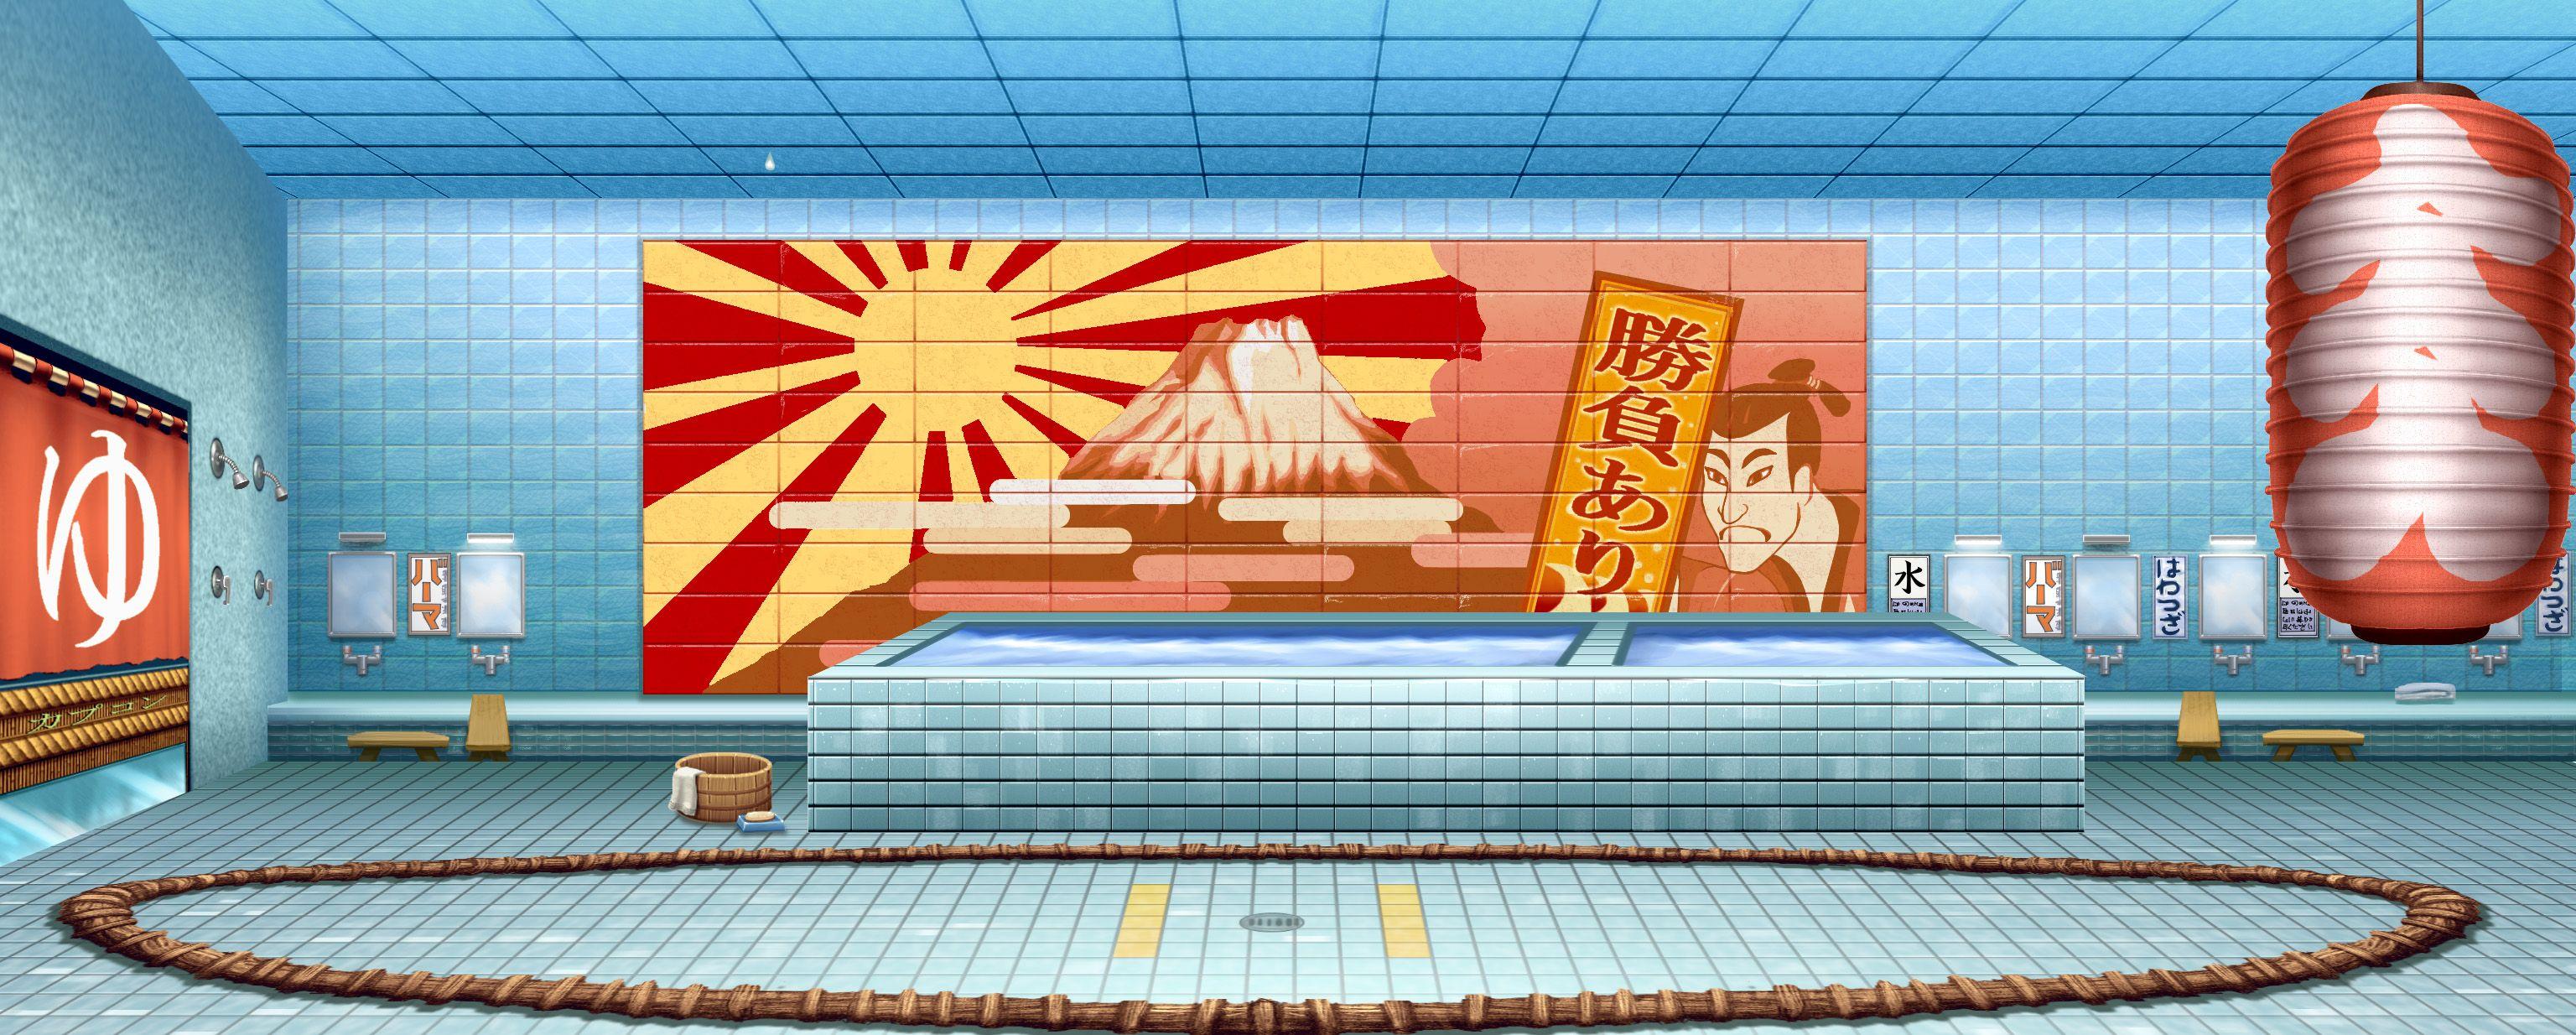 Street Fighter Background Desenhos Antigos Decoracao Nerd Desenhos